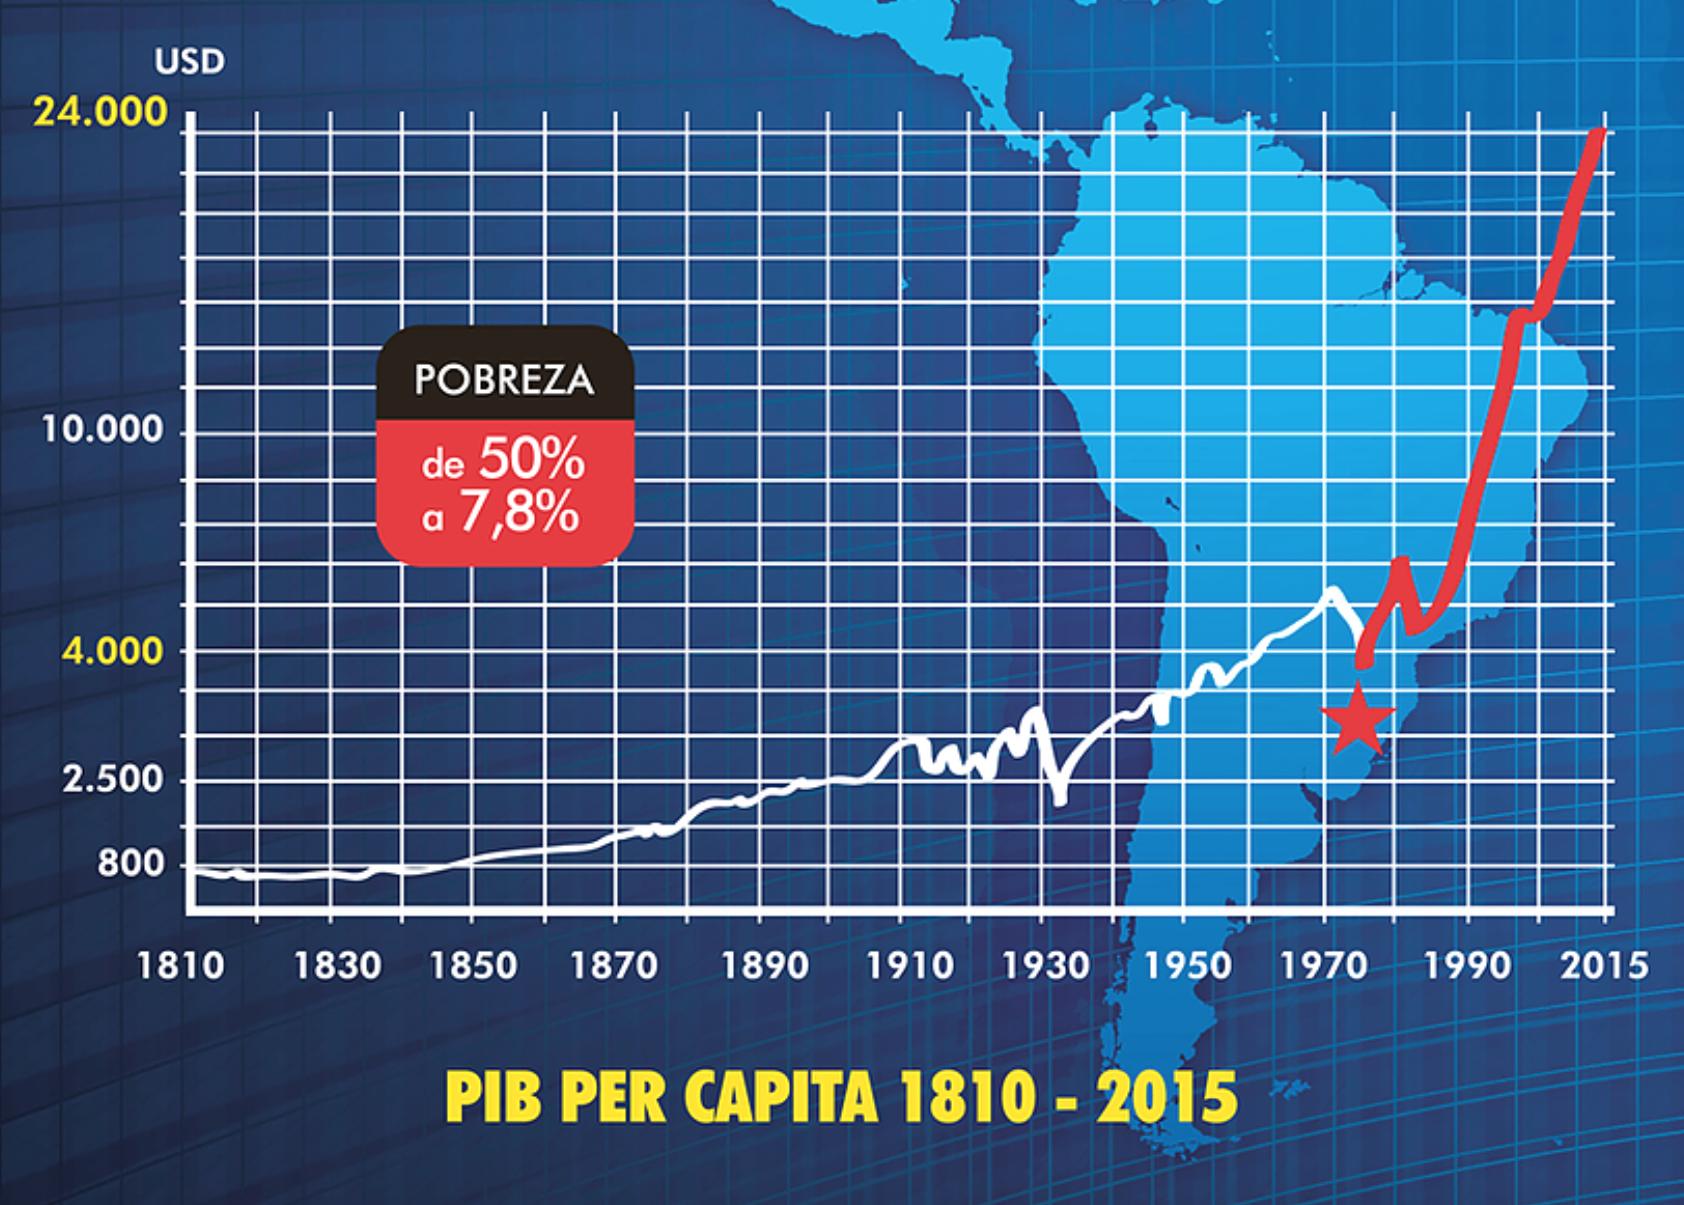 PIB-Chile-Cohete-MIlagro-Jose-Pinera-Pob